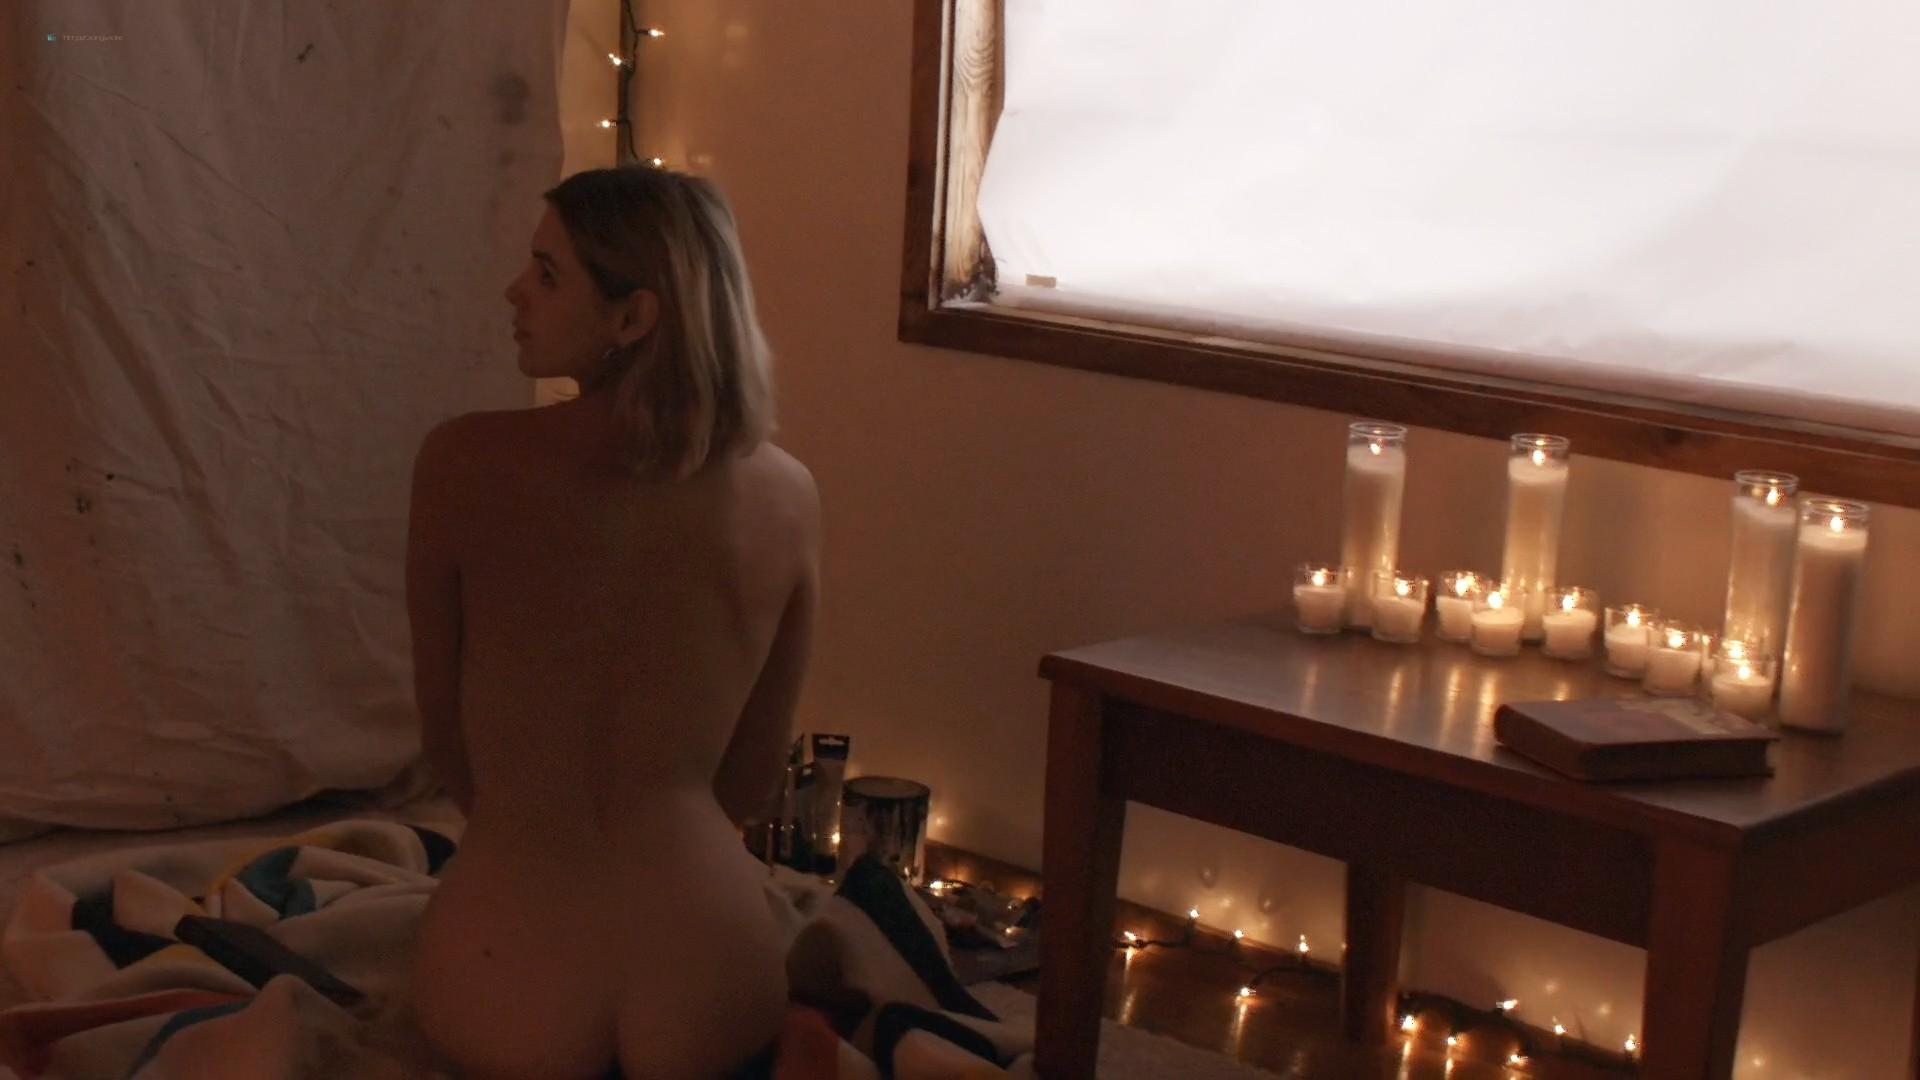 Caroline Vreeland busty see through Zoe Chait, Kenzie Dalton hot - Red Handed (2019) 1080p Web (13)